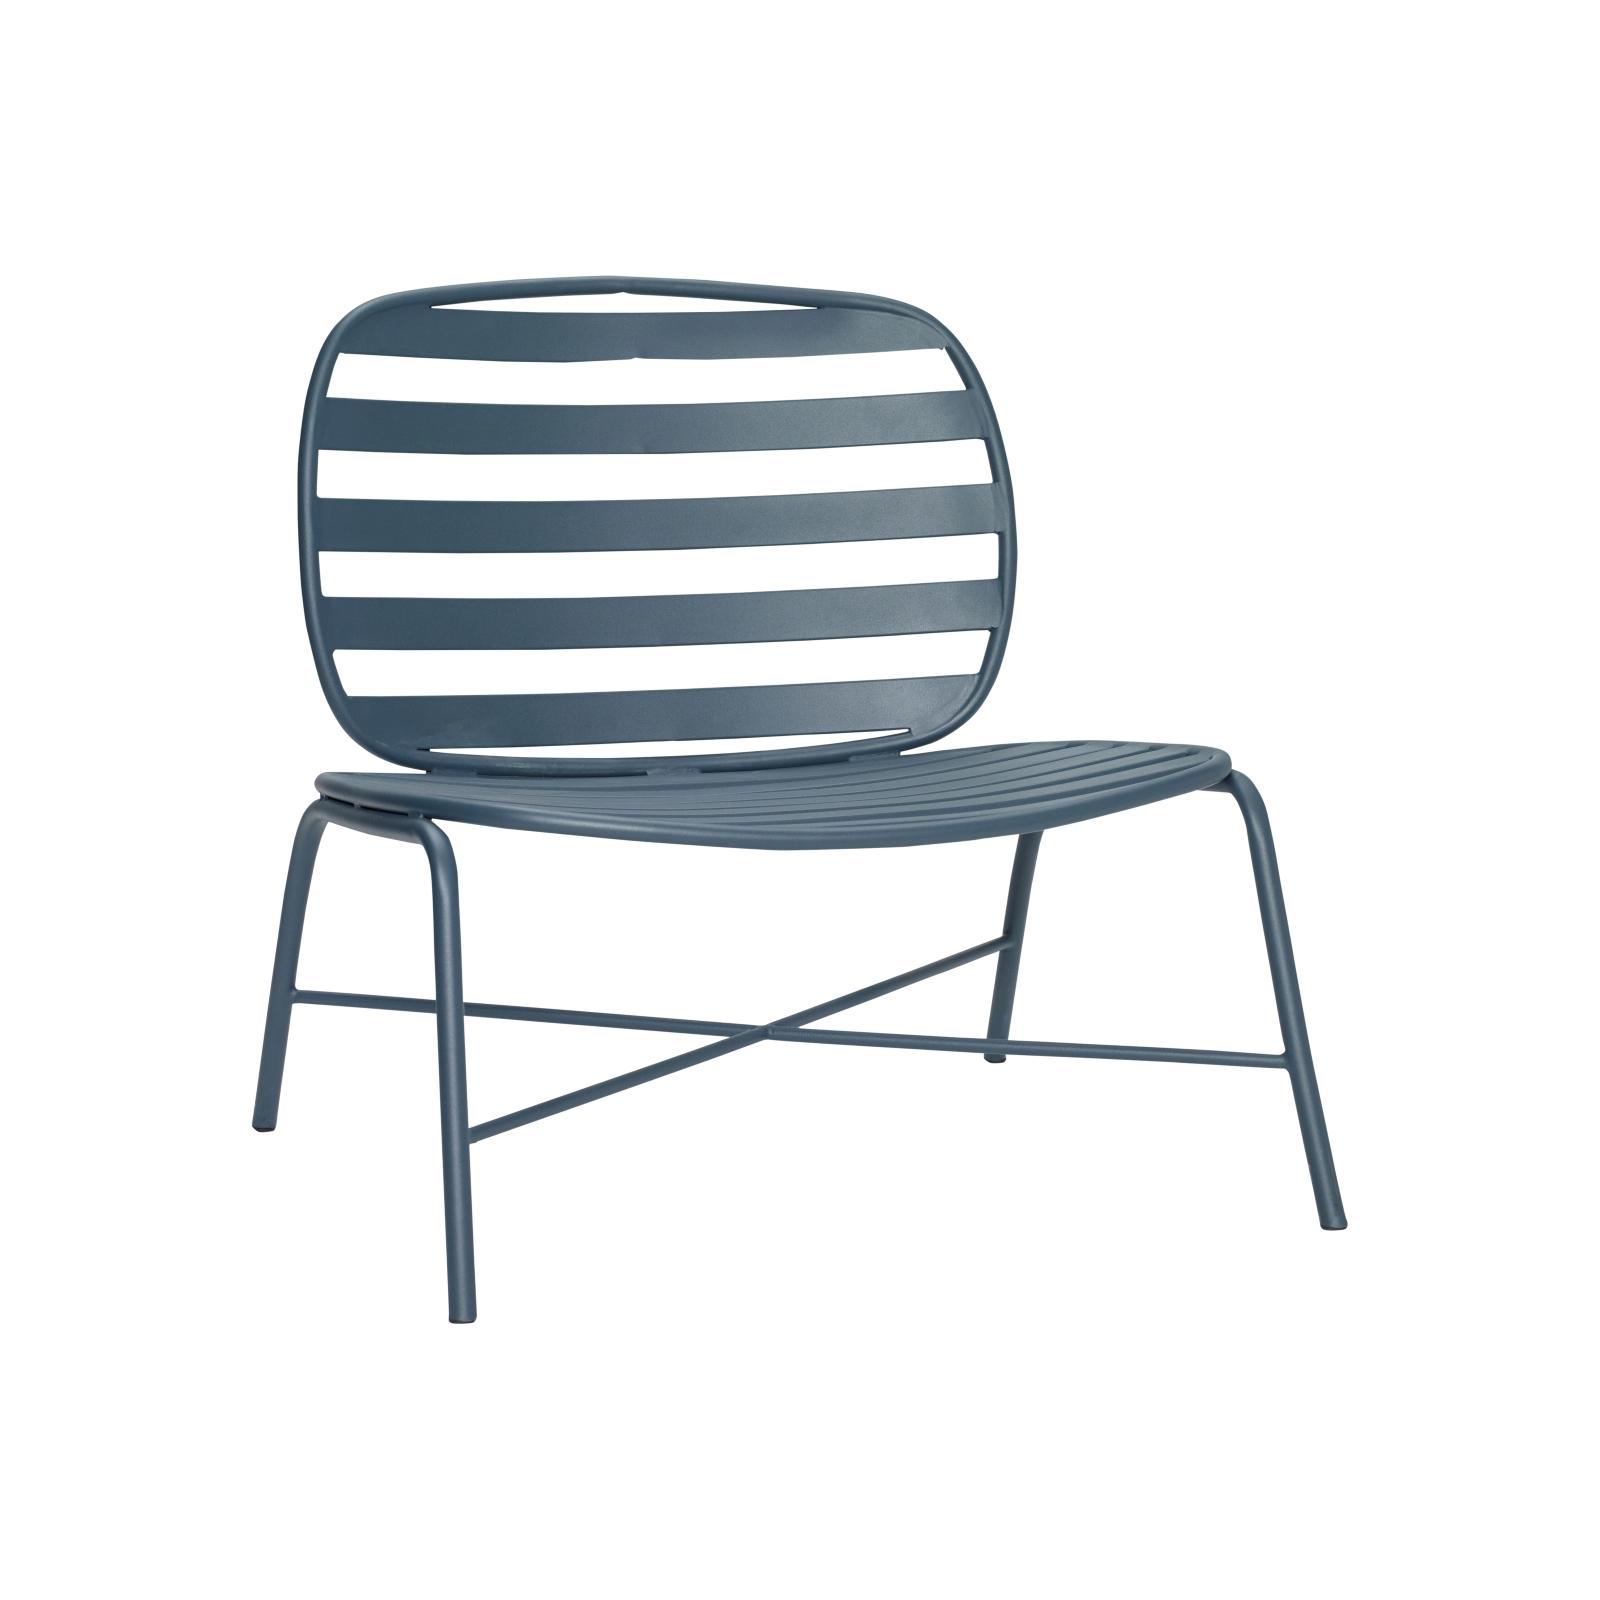 Lounge stol utomhus grön metall, Hubsch